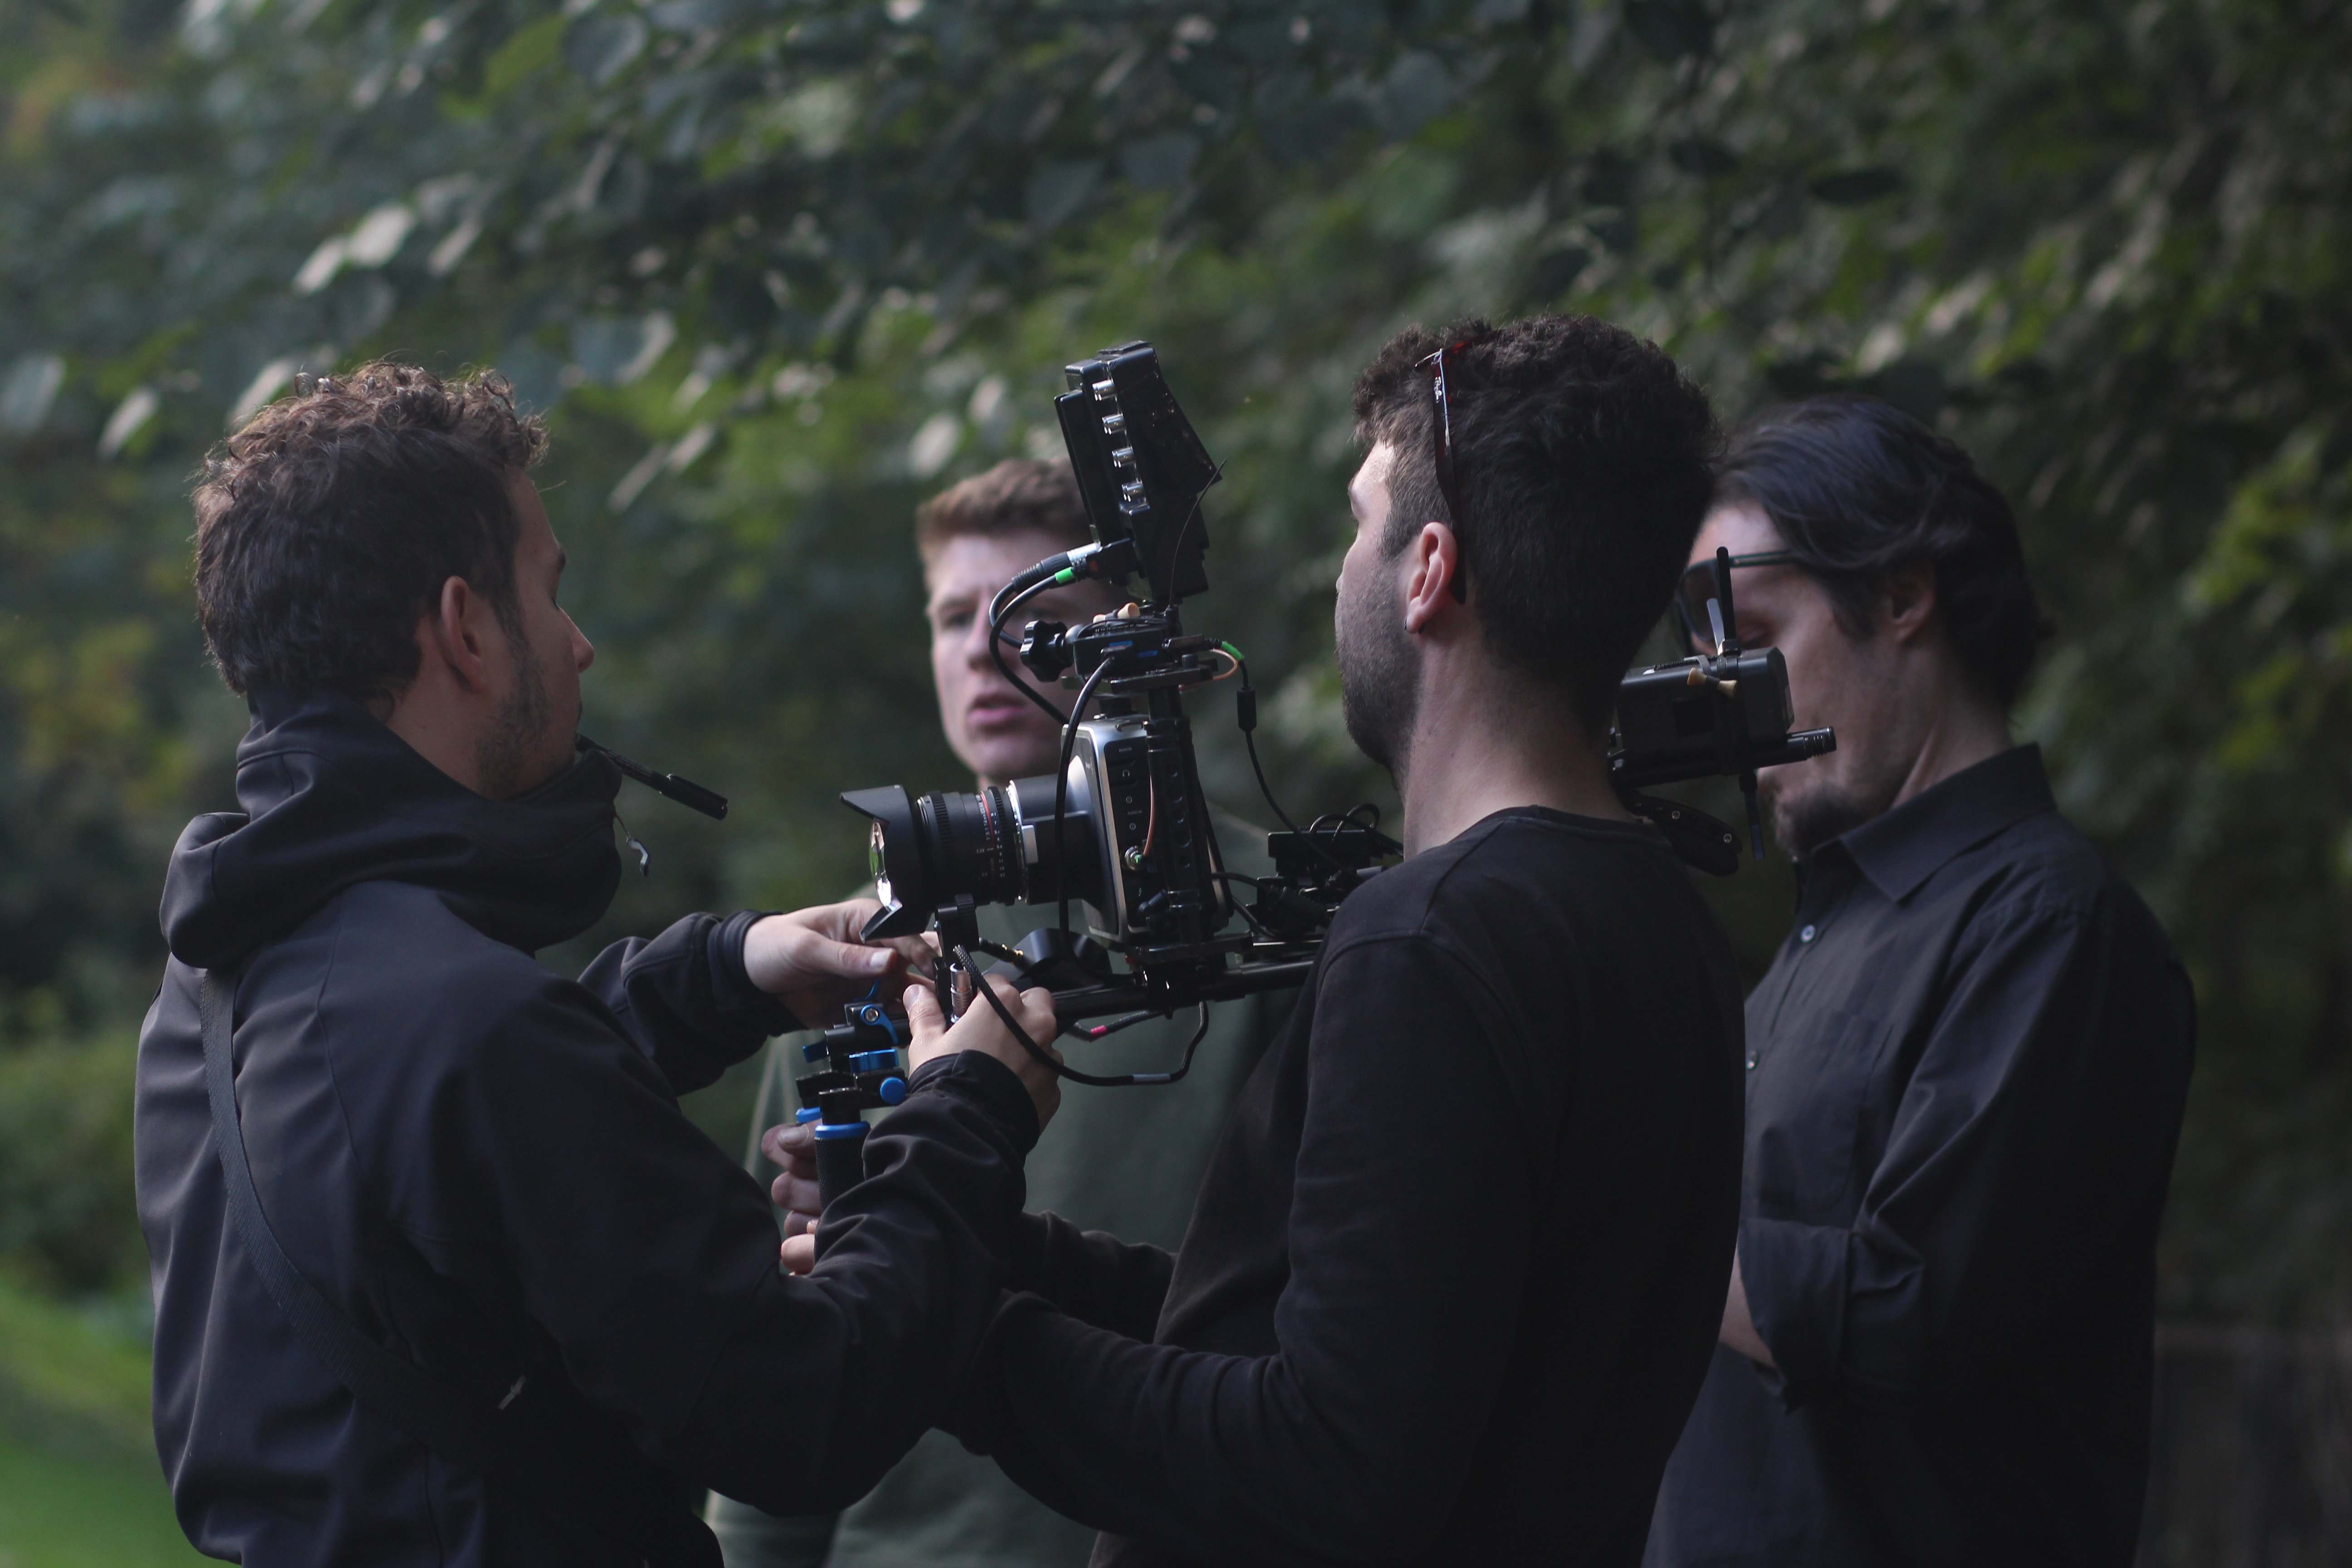 Camera Crew | The Turtle Terminator